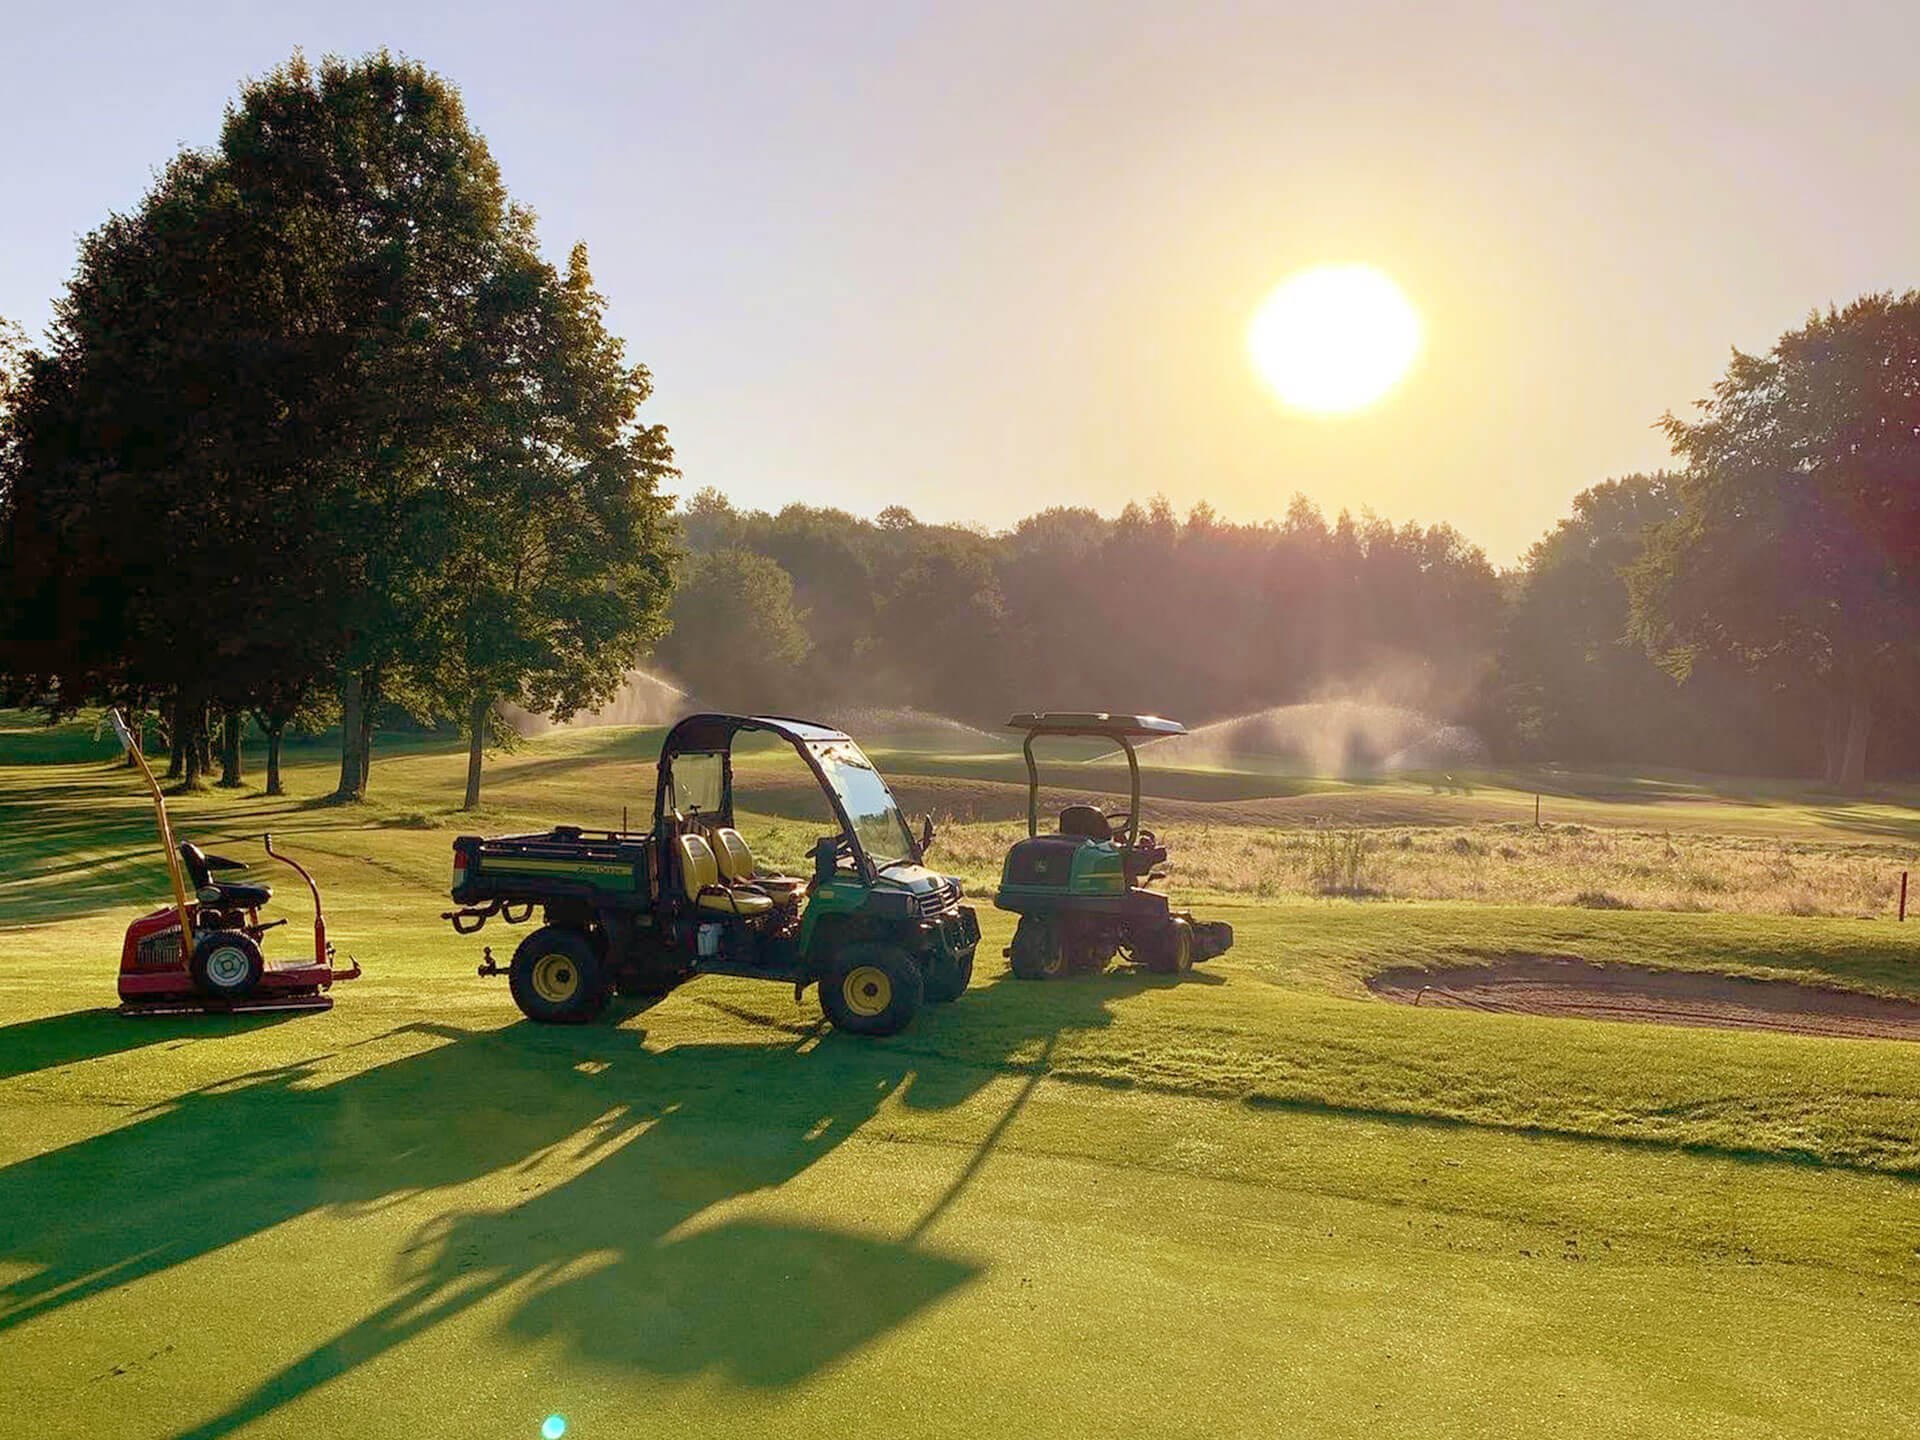 https://golfclub-peckeloh.de/wp-content/uploads/2020/08/Golfplatz_Morgenstimmung_August.jpg